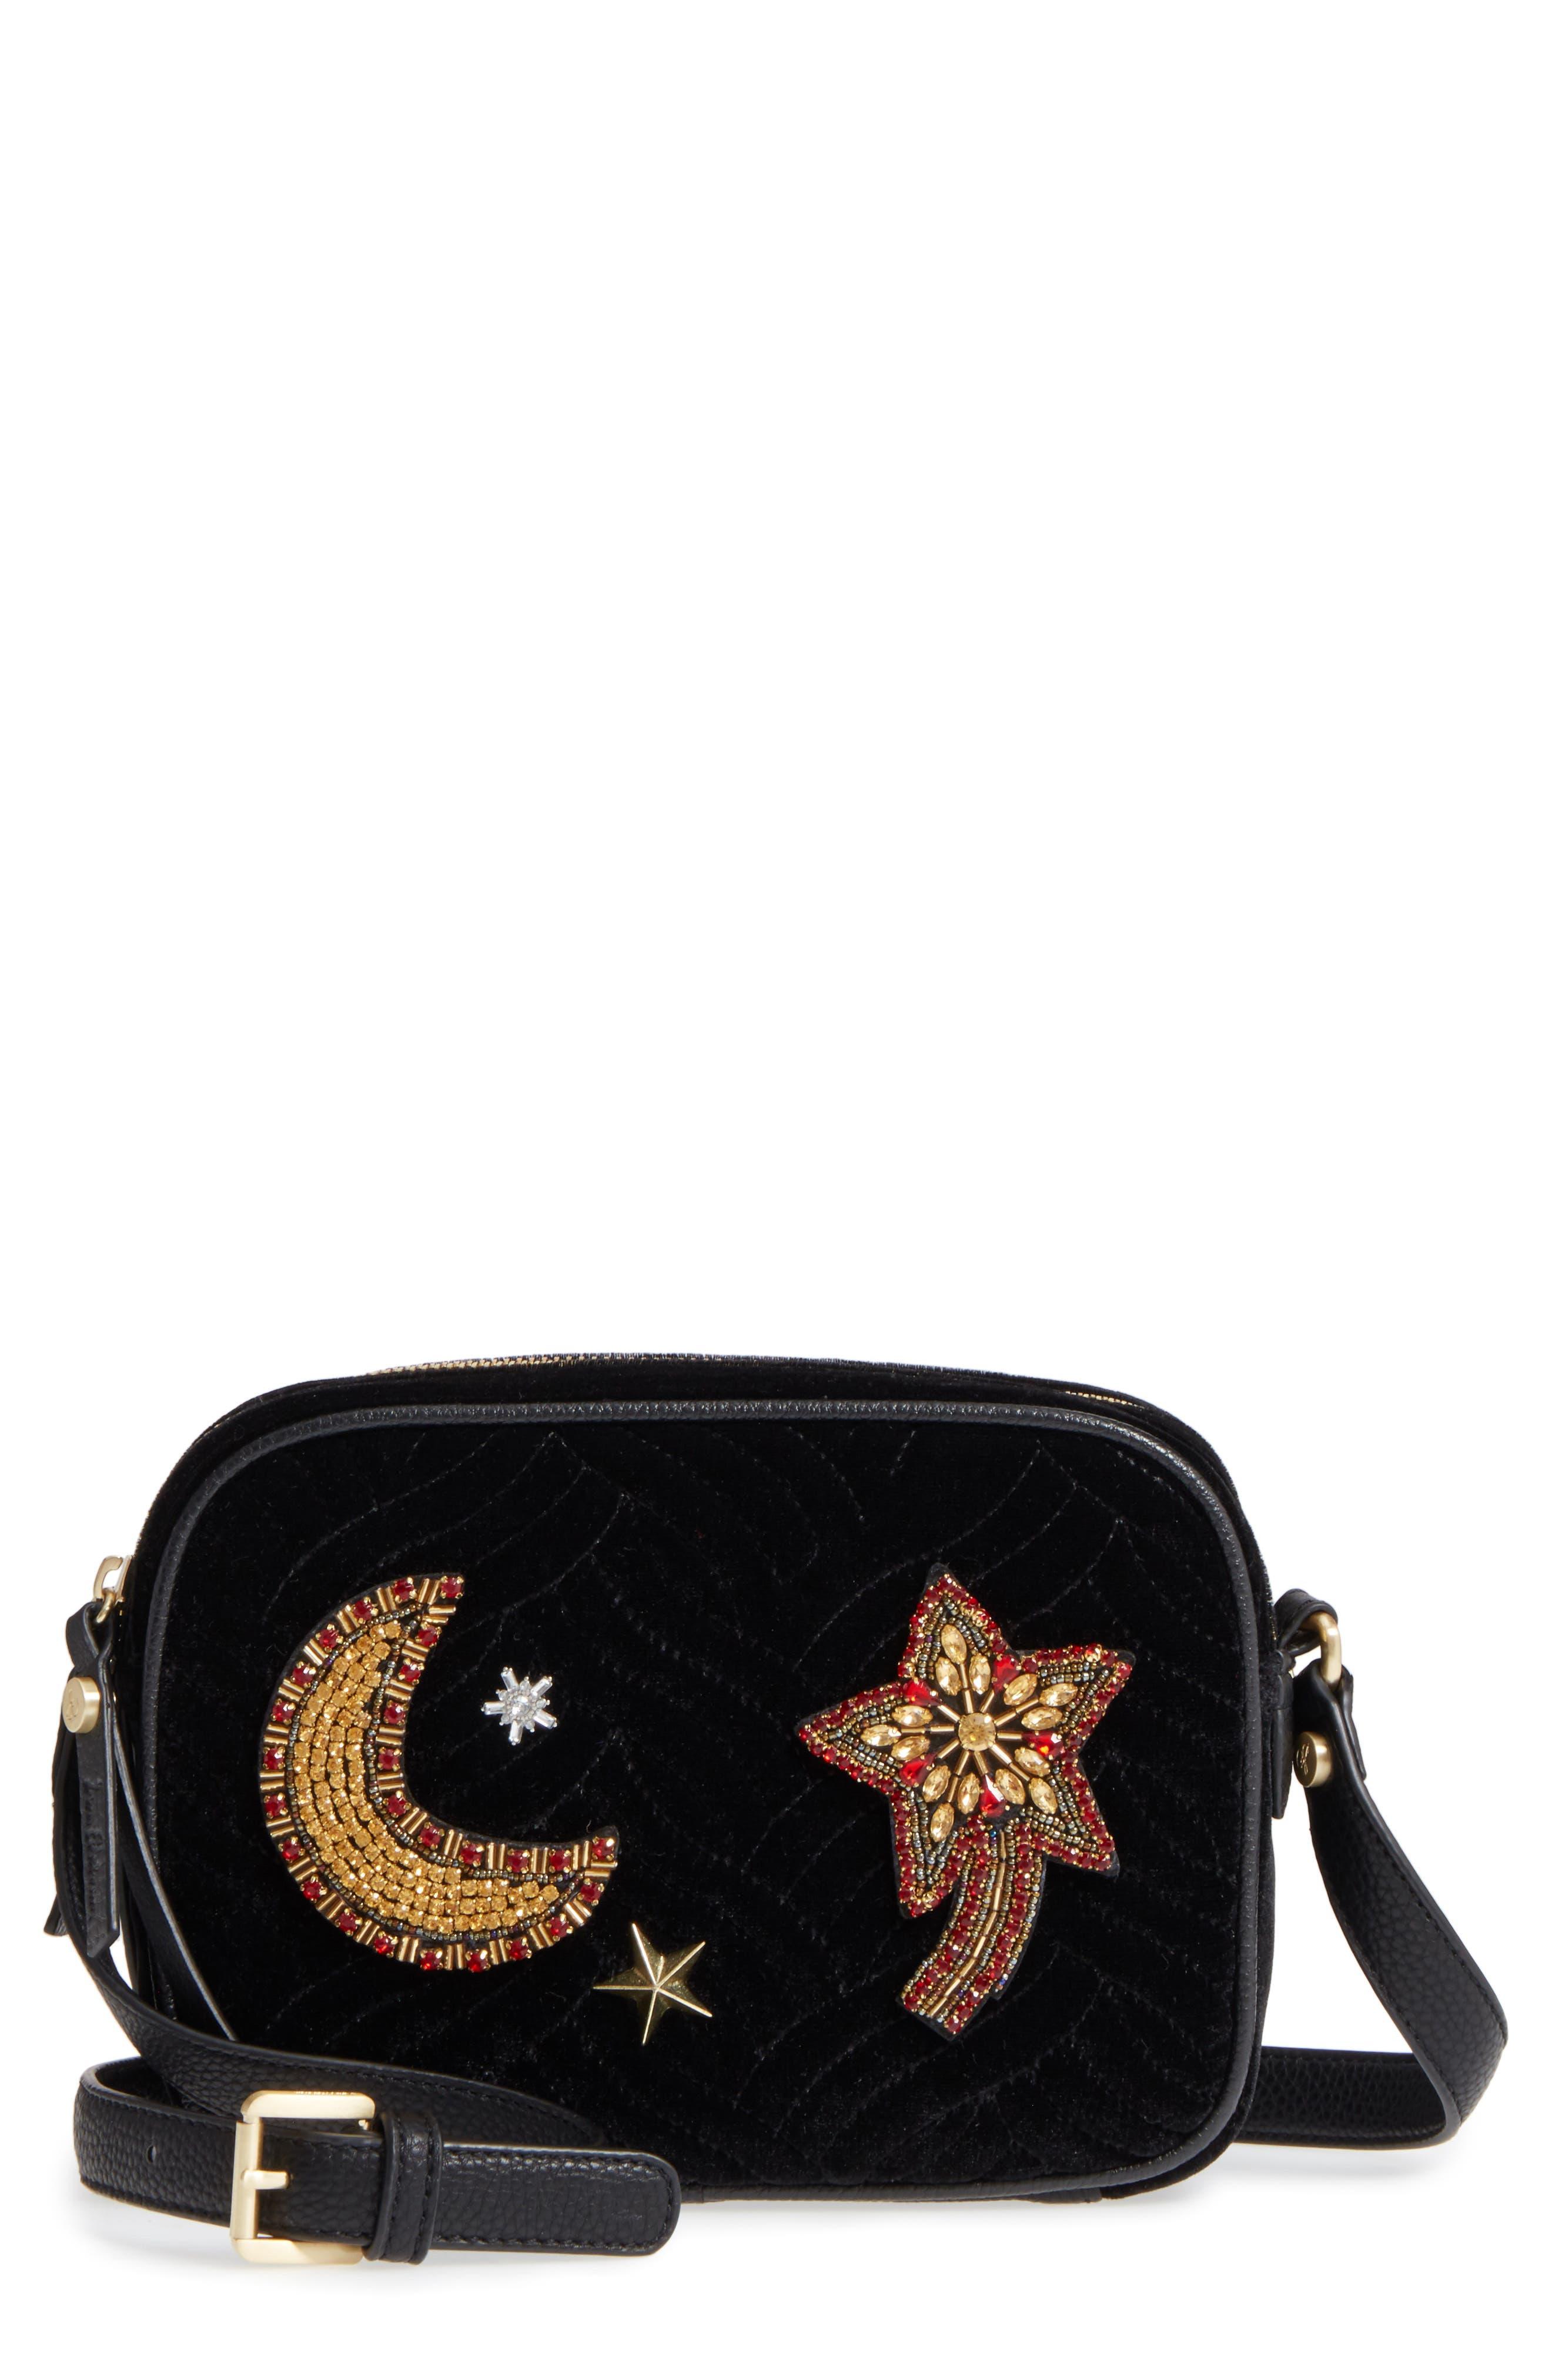 Perri Velvet Camera Crossbody Bag,                         Main,                         color, Black Moon/ Star